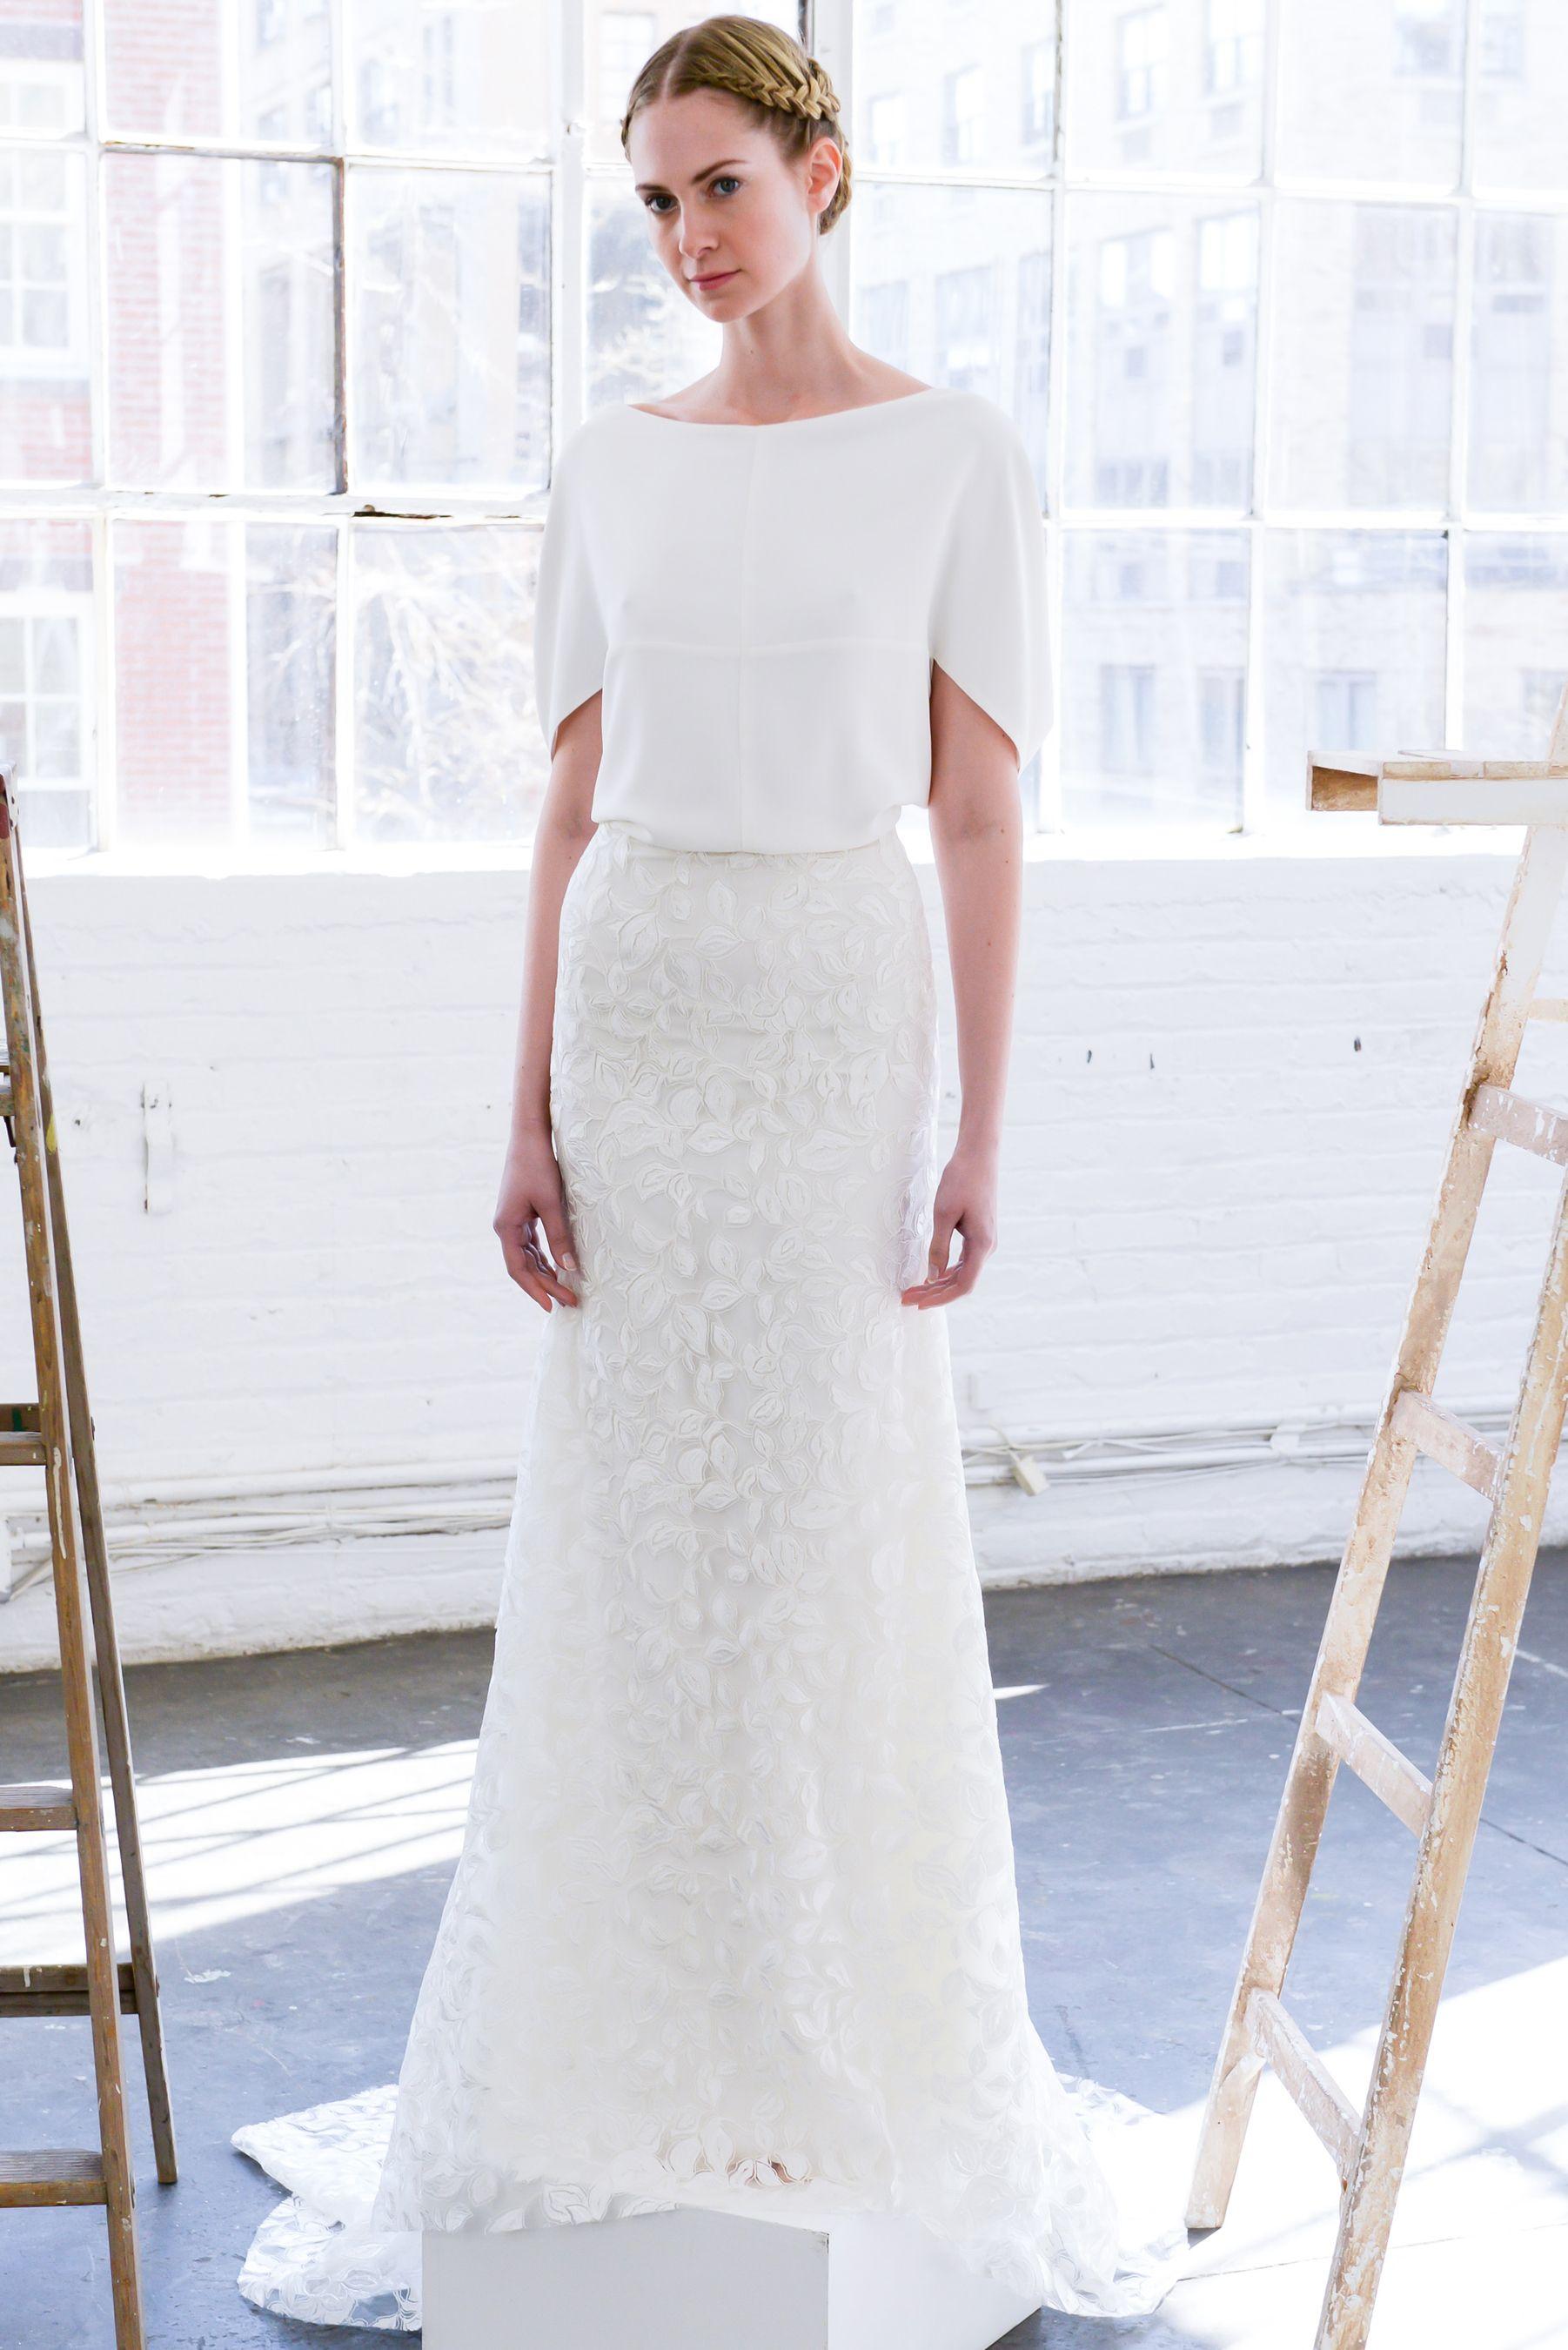 Simple Wedding Dresses From Fall  Bridal Week  Lela rose